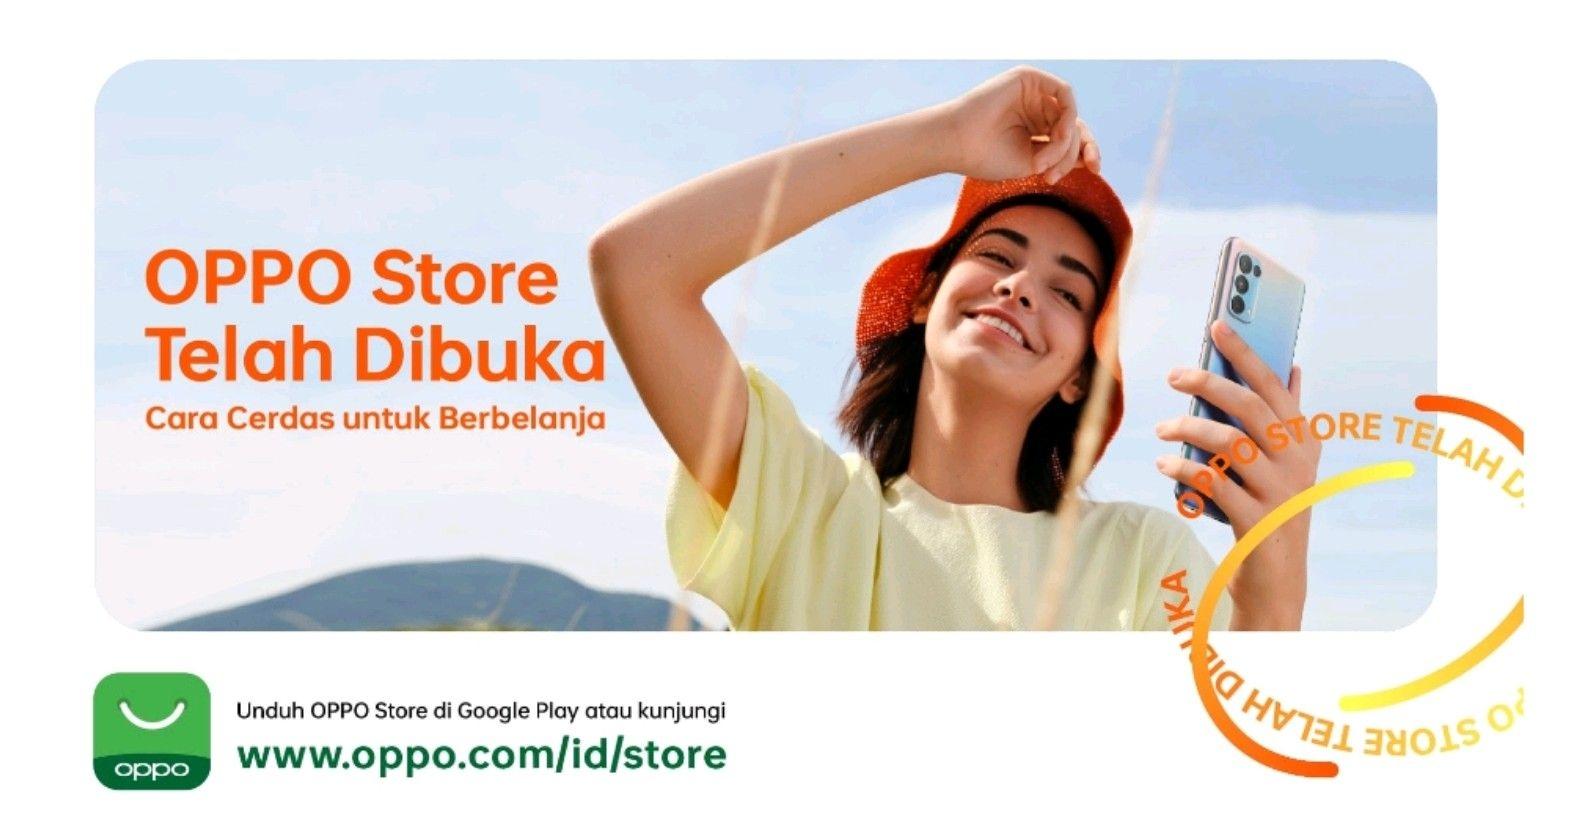 Penuhi Kebutuhan Belanja Online, OPPO Hadirkan OPPO Store